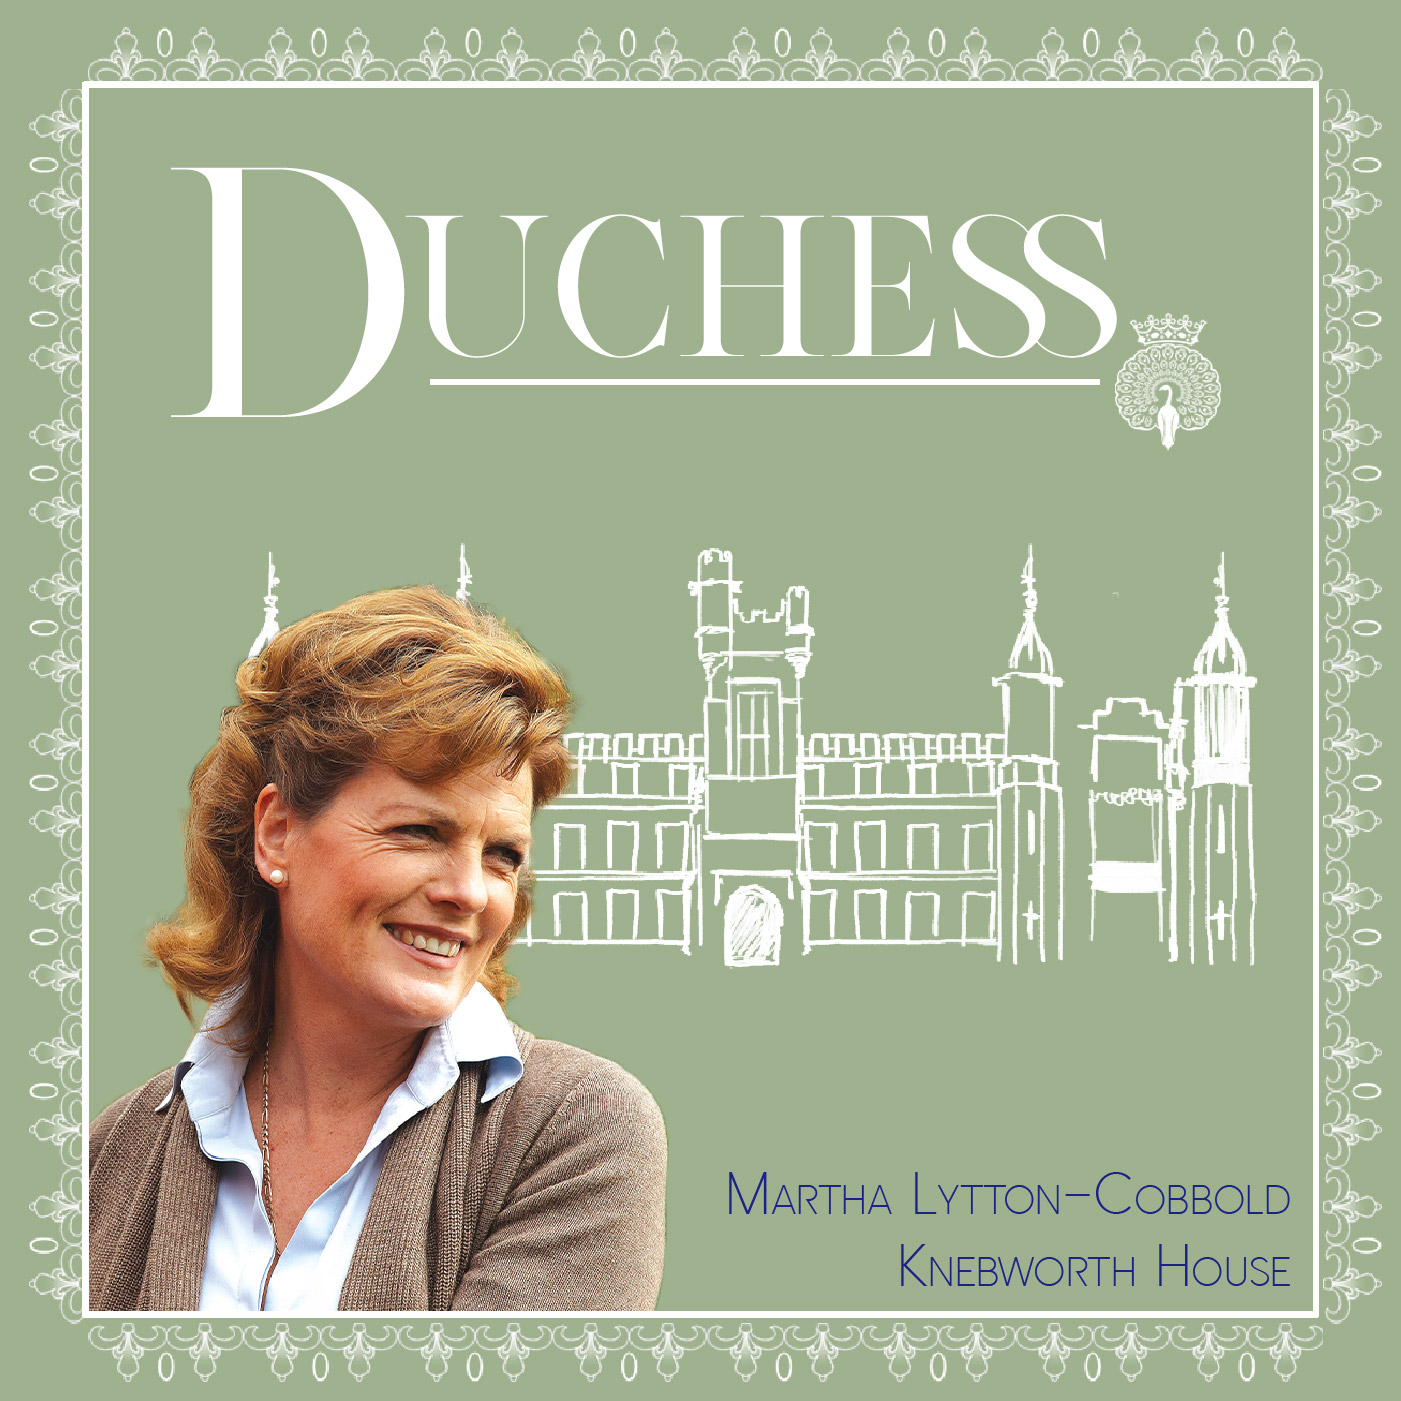 Martha Lytton-Cobbold of Knebworth House